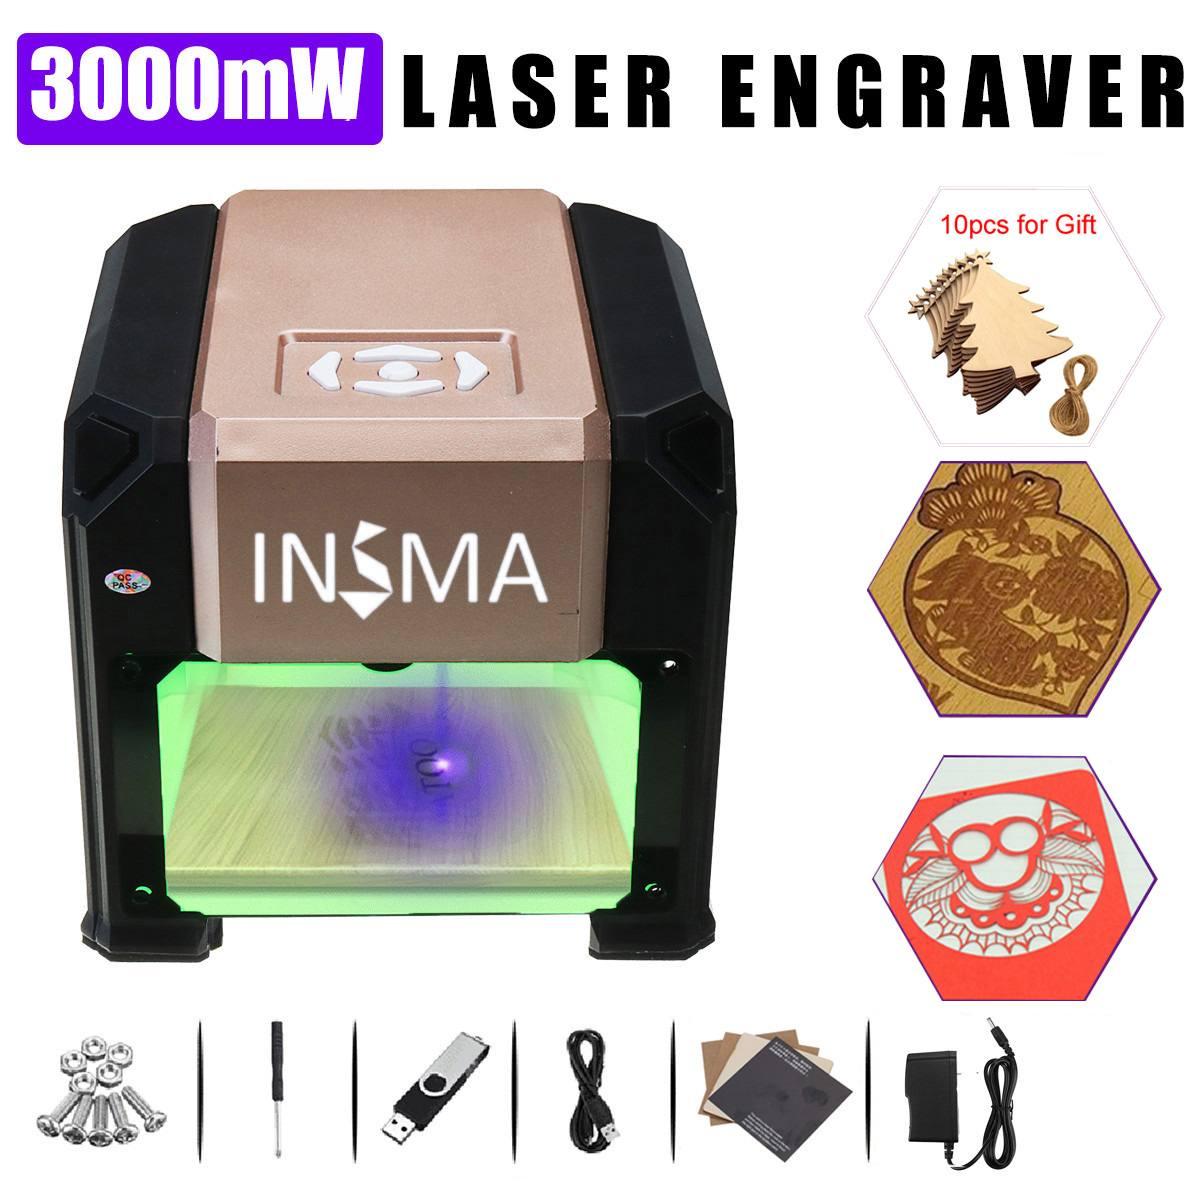 3000 mW CNC Laser Engraver DIY Logo Mark Printer Laser Engraving Carving Machine for FOR Windows for Mac OS System